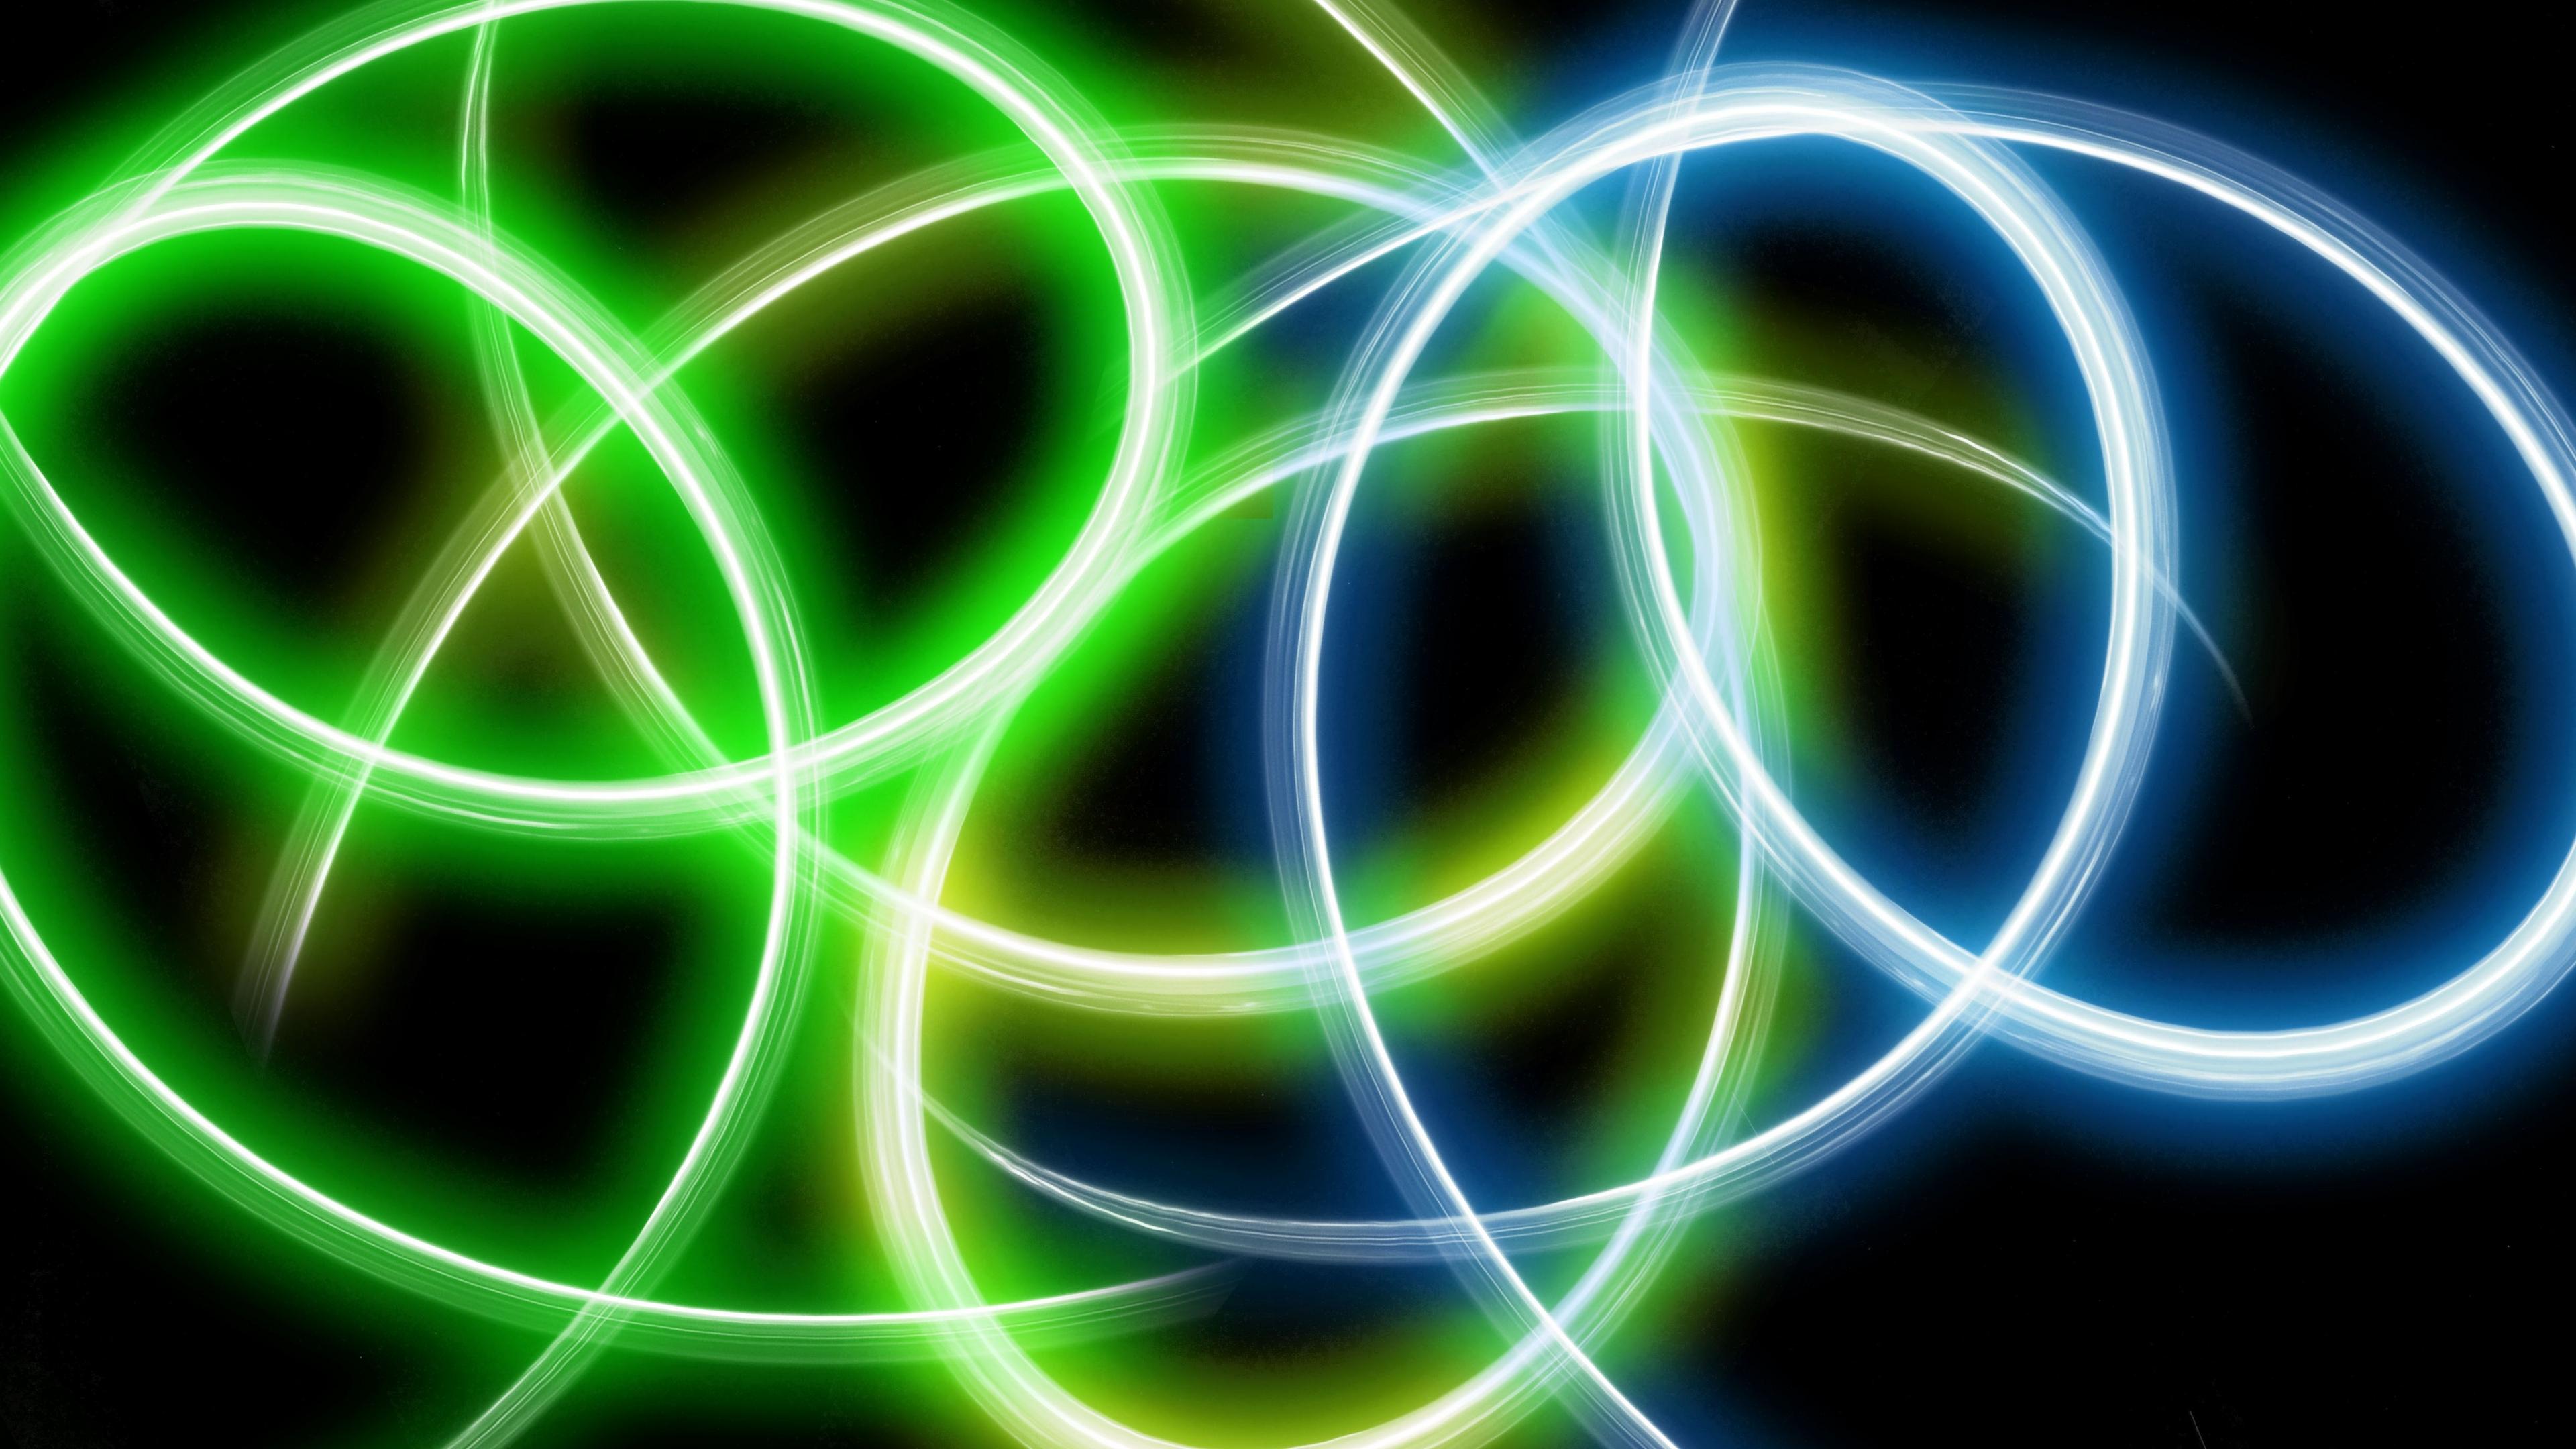 circles lines glowing 4k 1539369931 - circles, lines, glowing 4k - Lines, Glowing, Circles